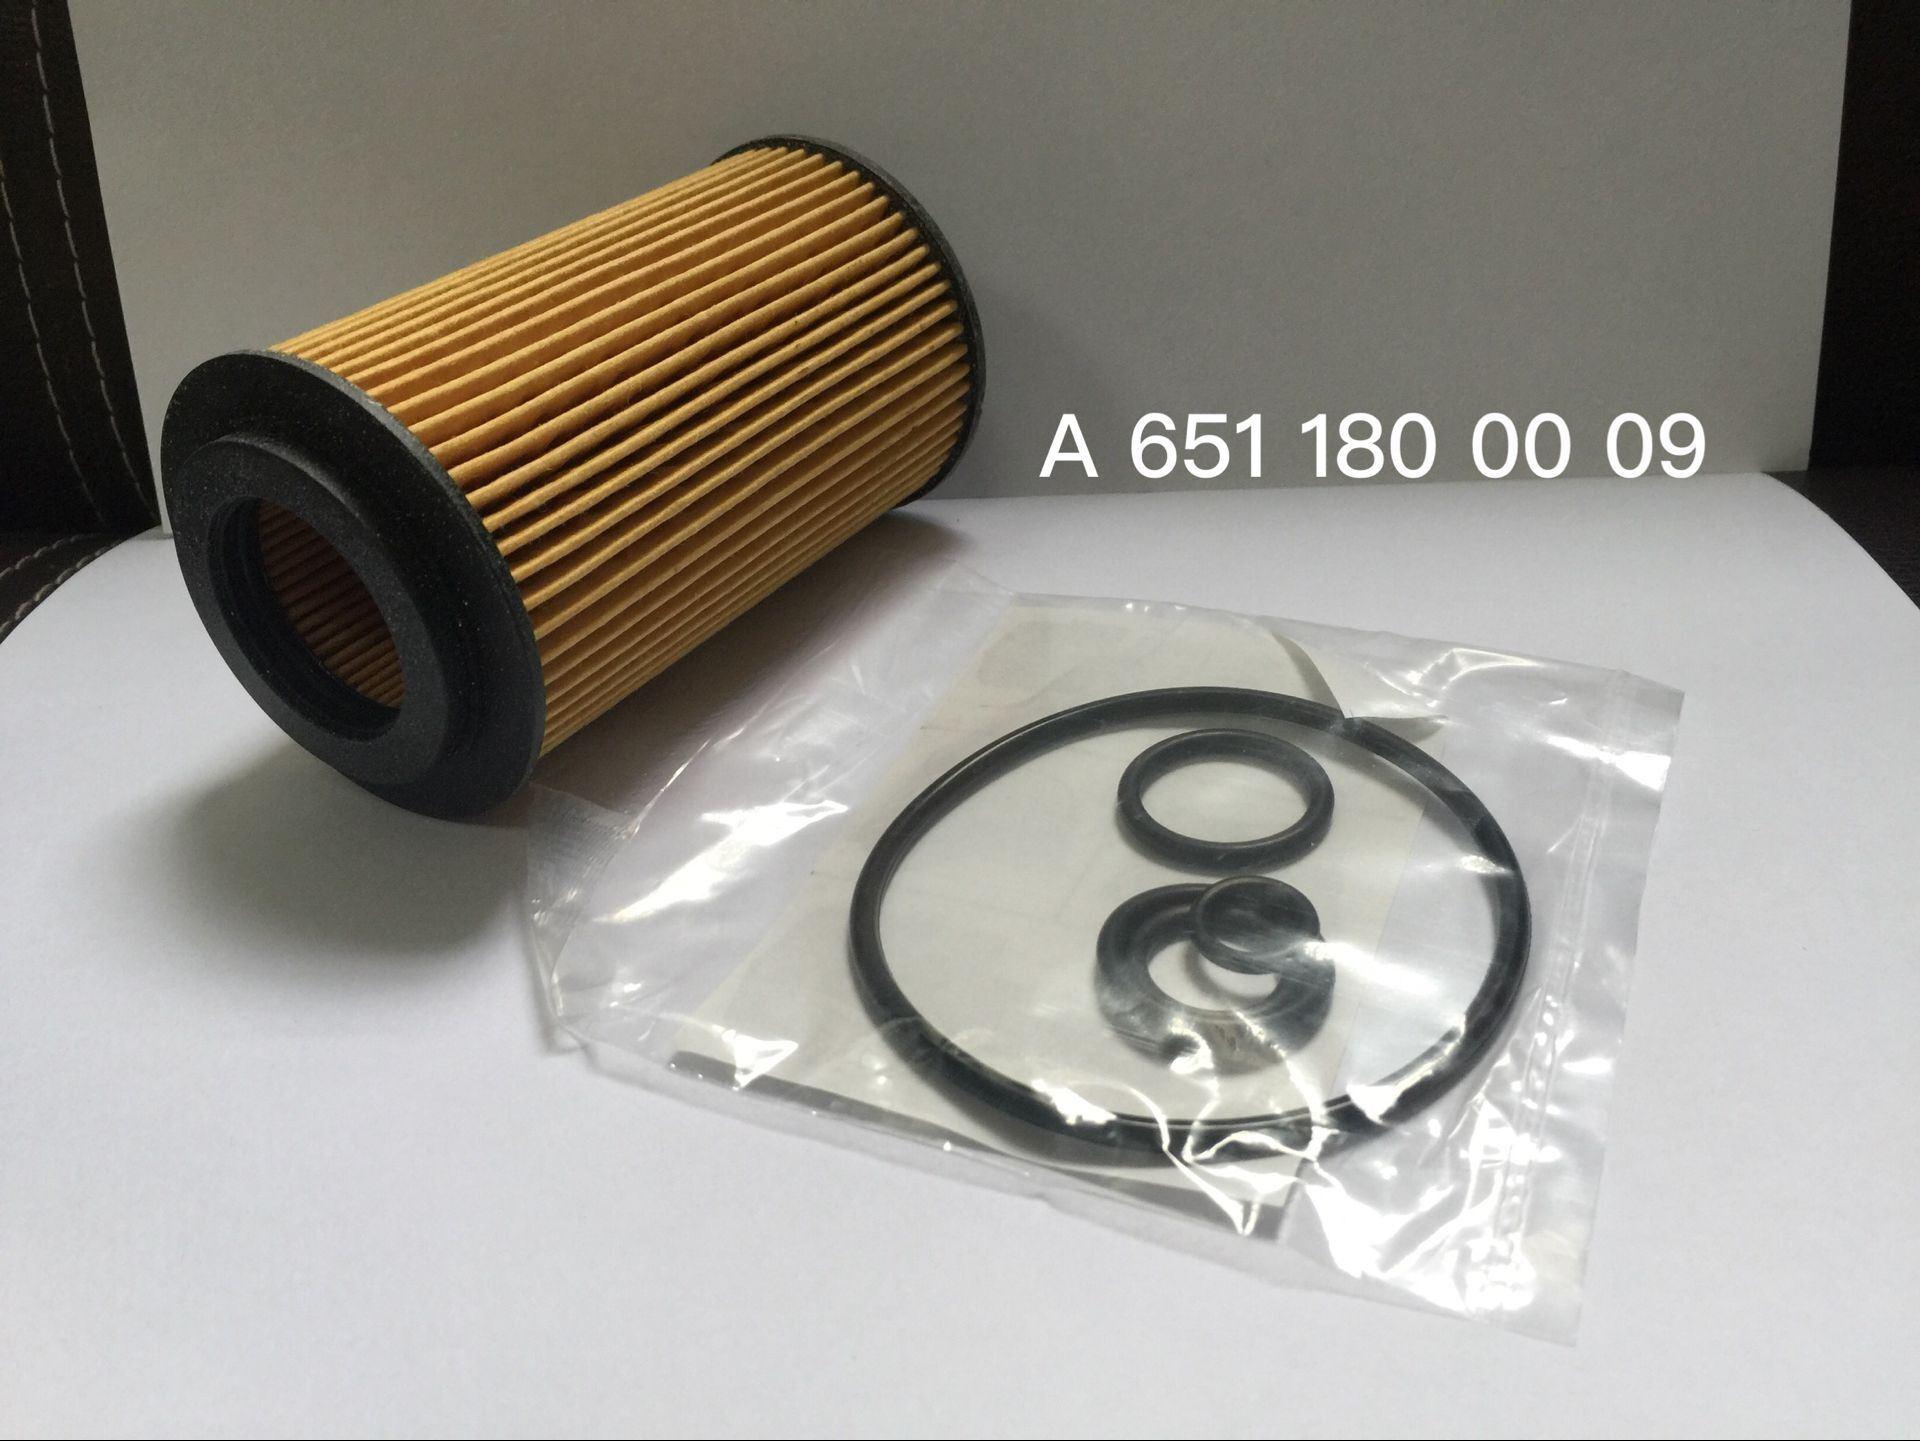 Oil Filter for Mercedes-Benz 651 180 00 09